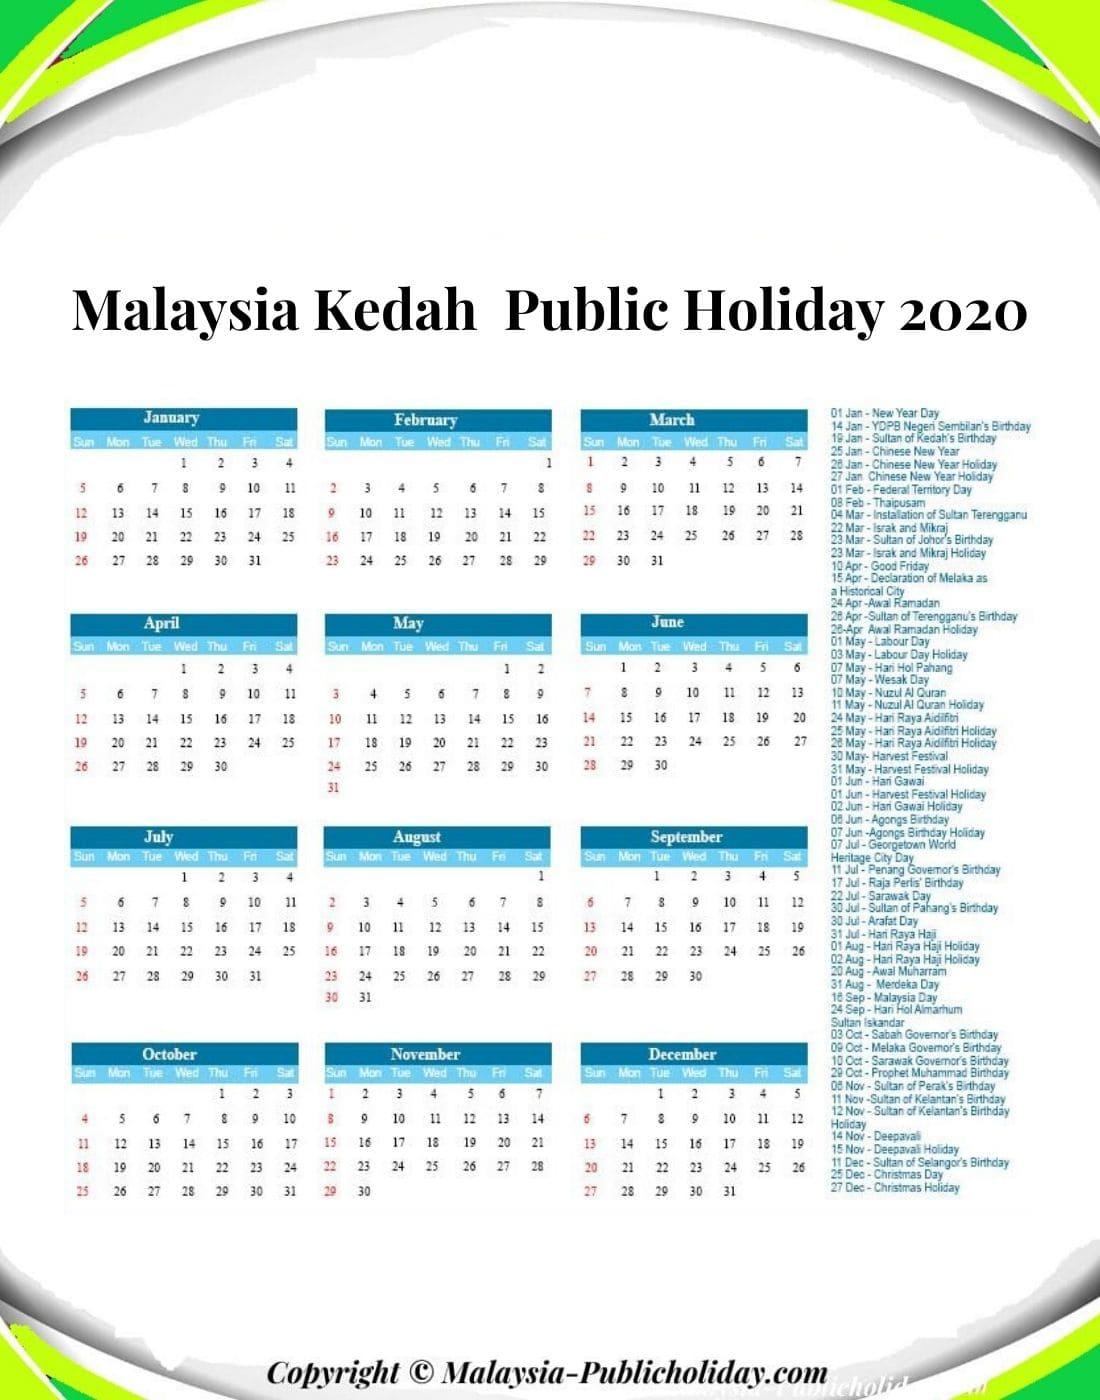 Kedah Holiday 2020 Malaysia